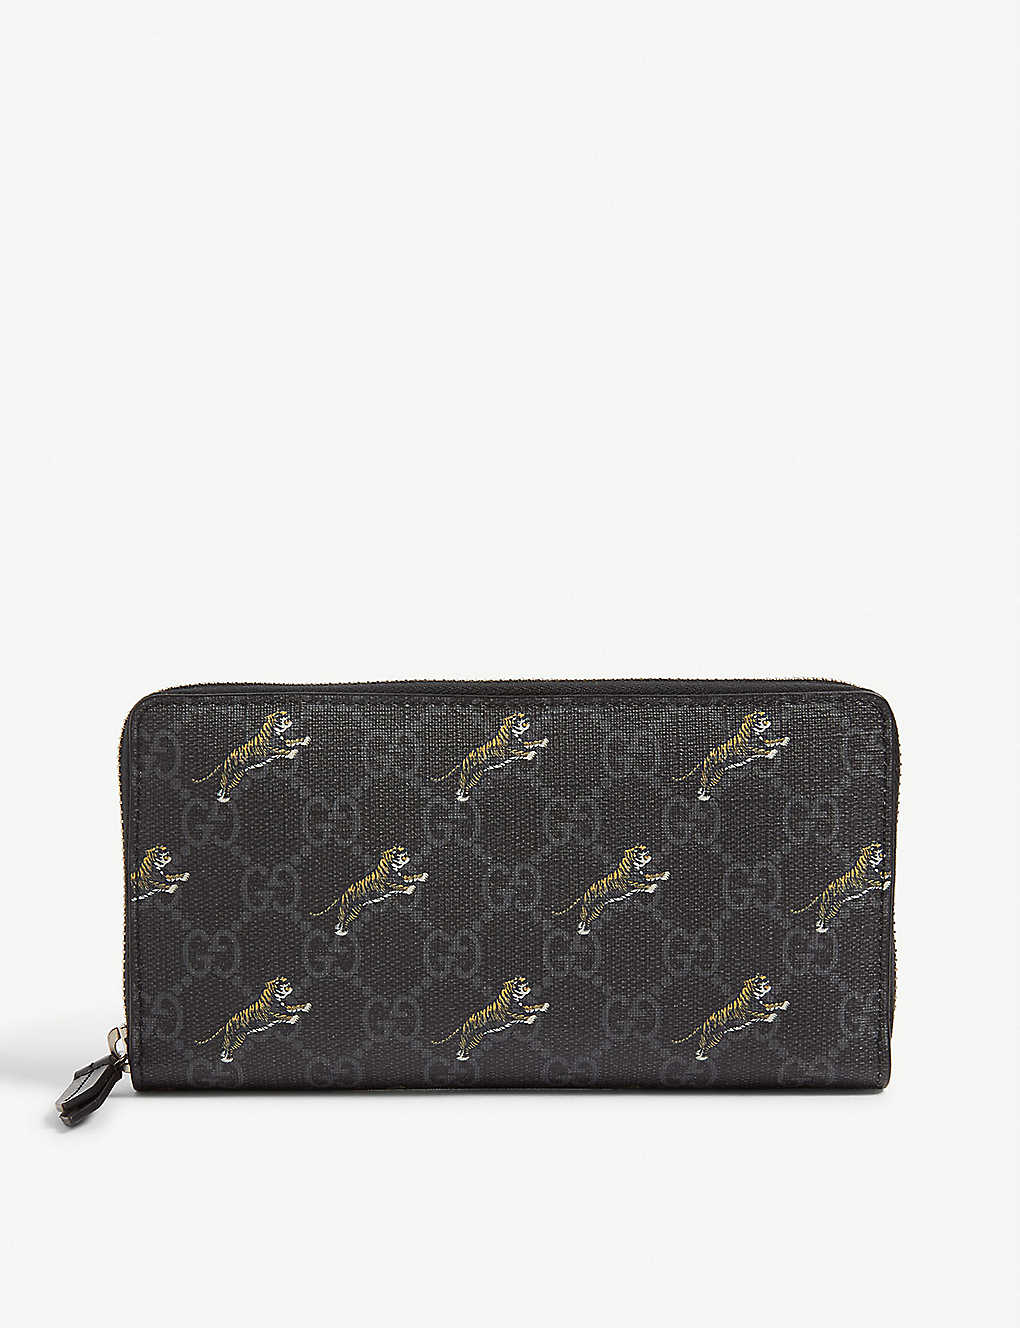 0ab5be7a7 GUCCI - GG supreme zip wallet   Selfridges.com